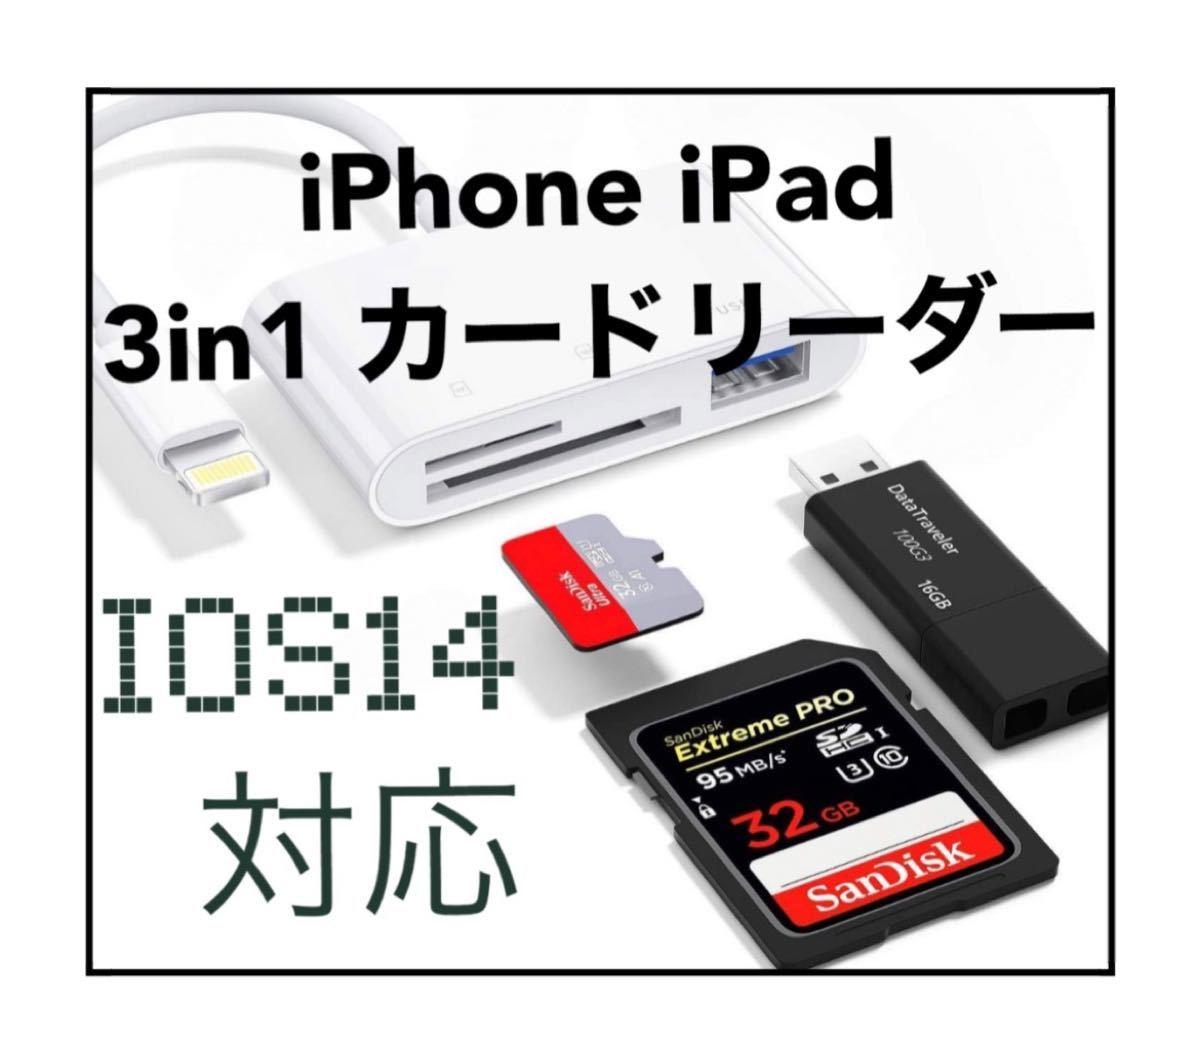 iPhone SD カードリーダー 最新 iOS14 双方向 高速 転送 Office 書類 転送 読み書き カメラ 3in1